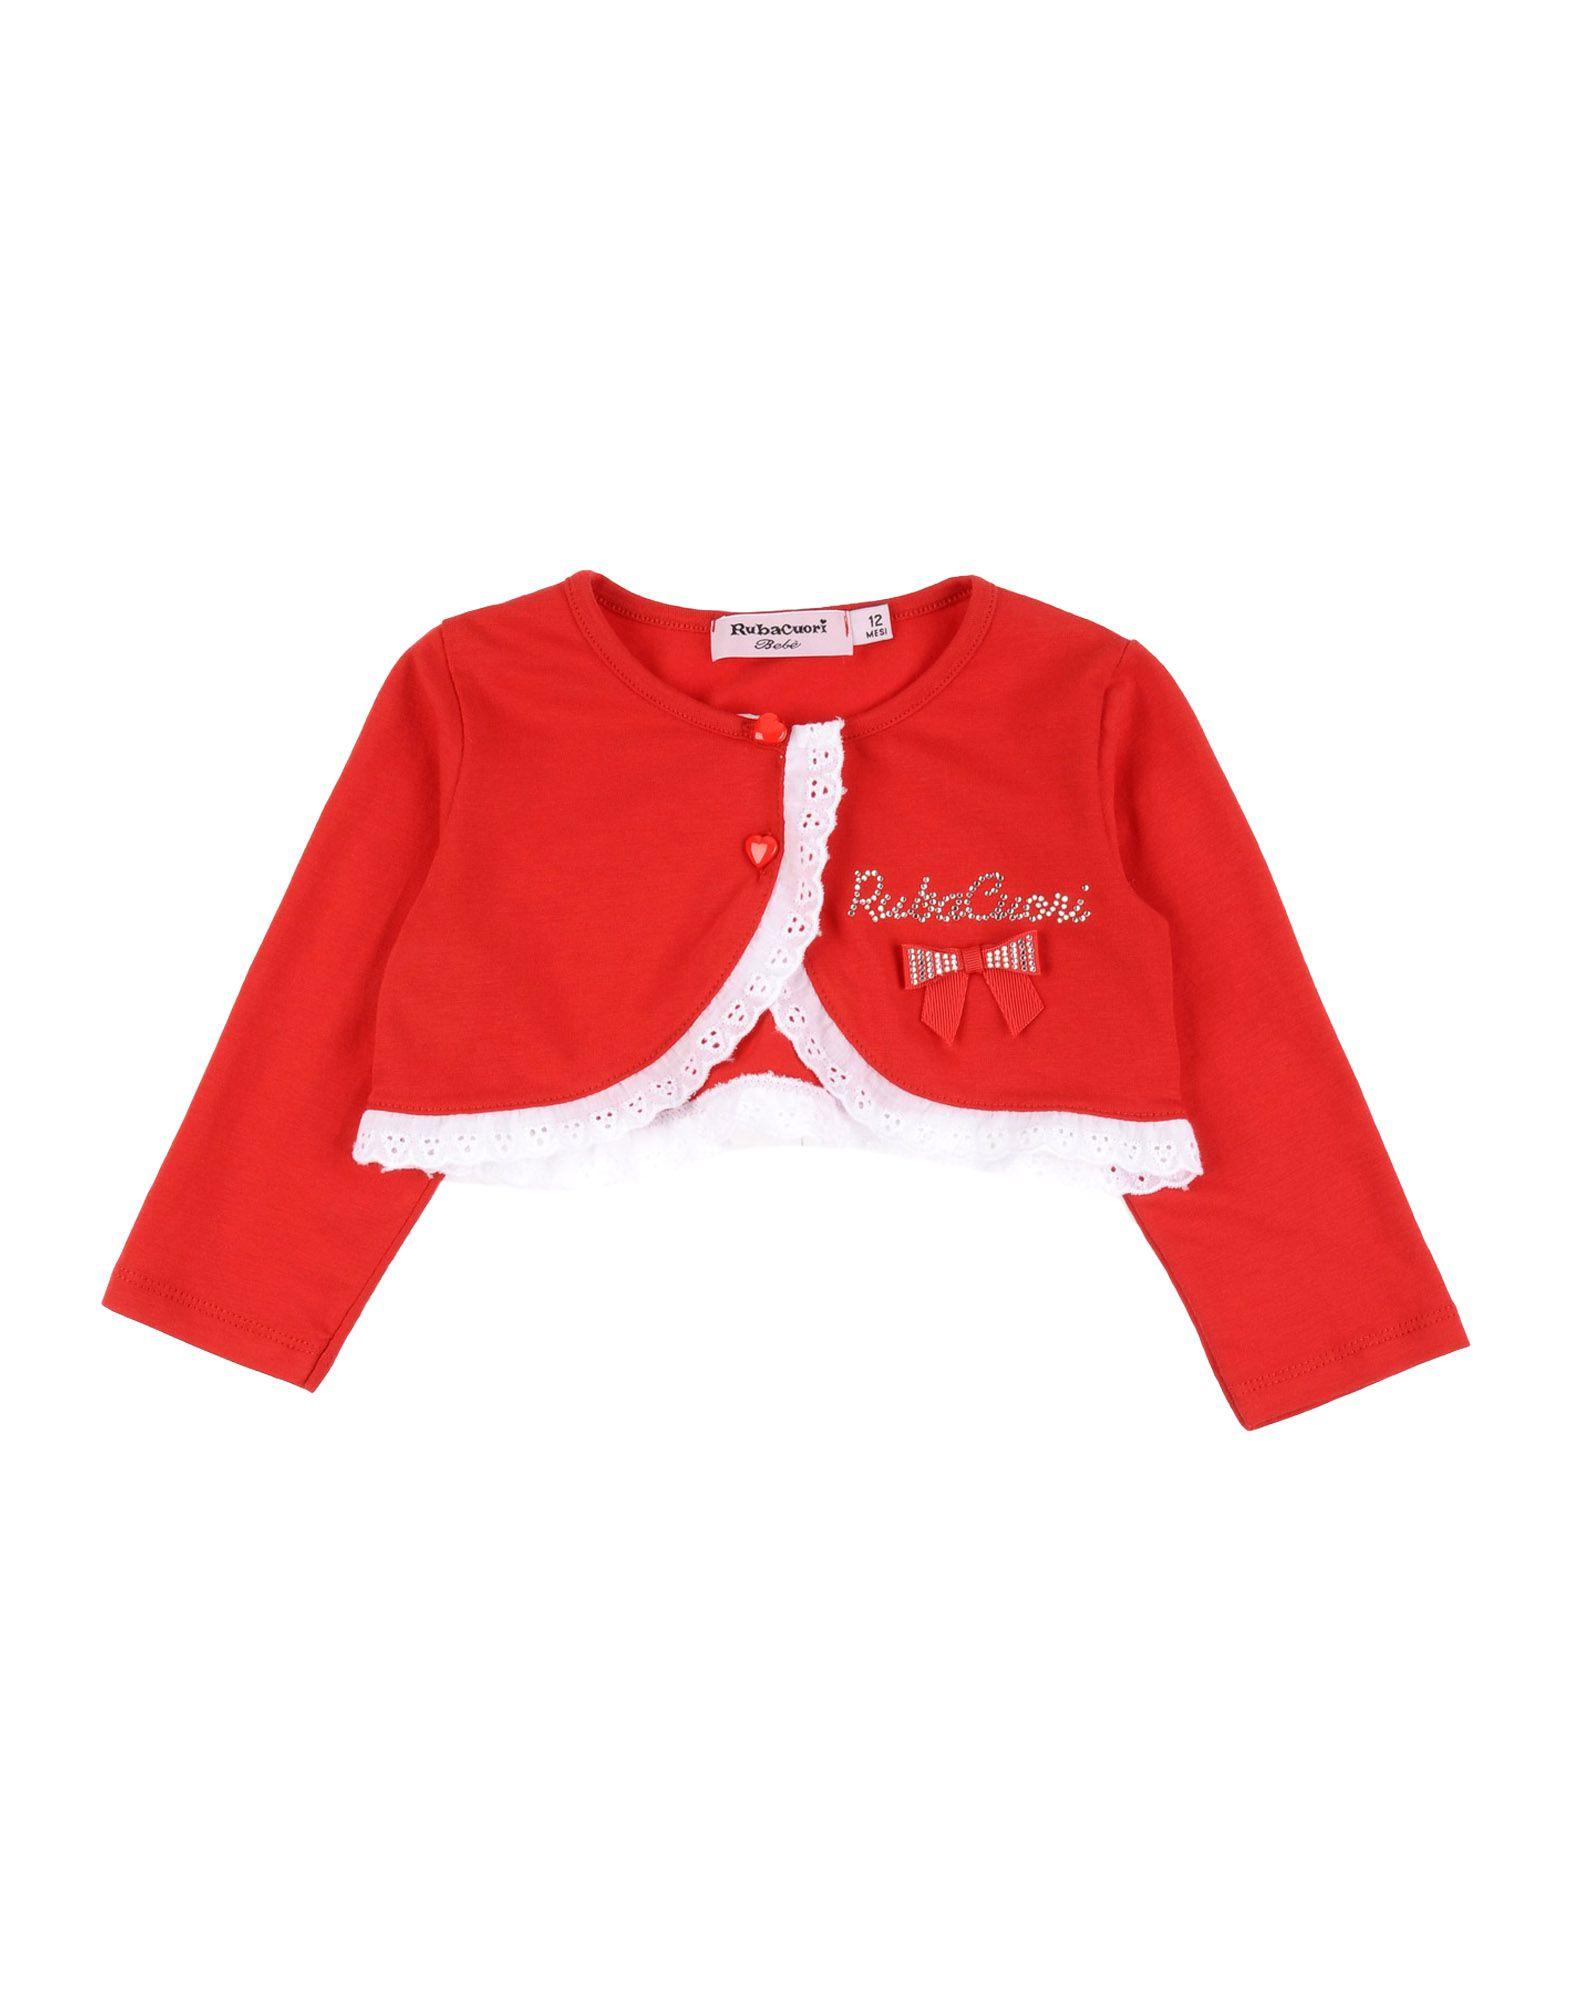 RUBACUORI BEBE´ Mädchen 0-24 monate Strickjacke Farbe Rot Größe 6